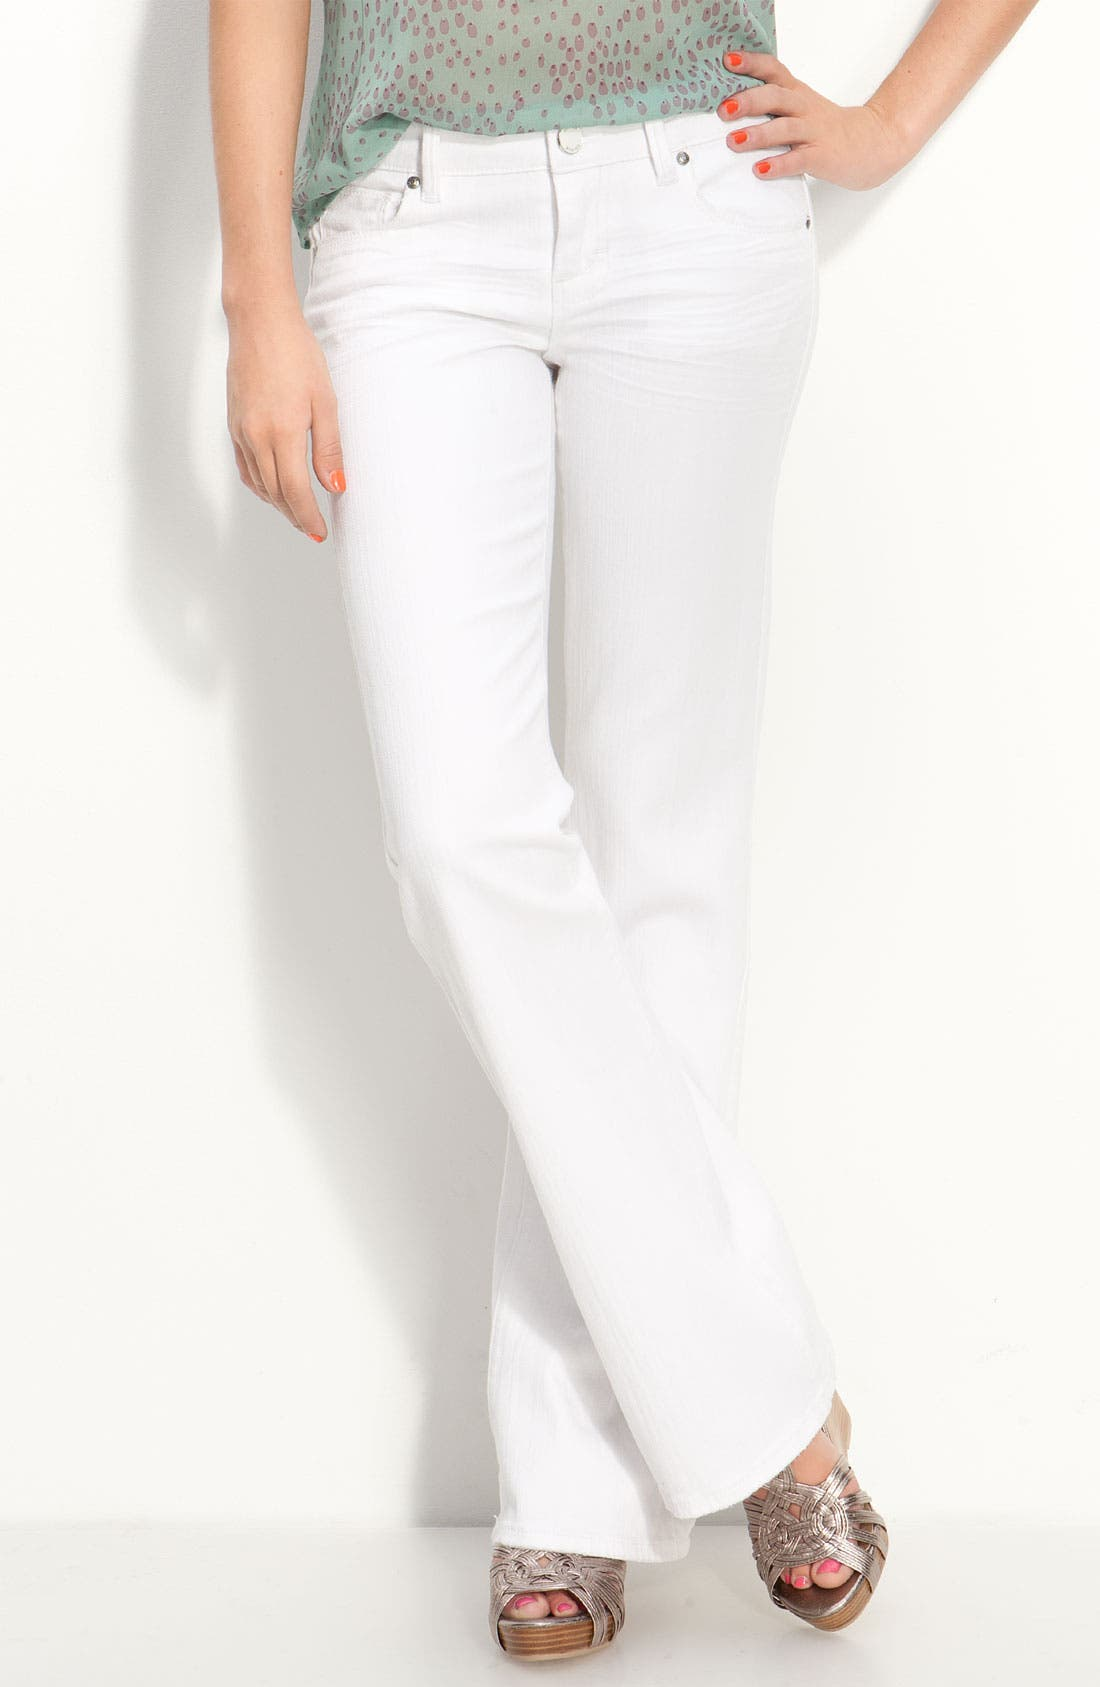 Alternate Image 1 Selected - STS Blue 'Getaway' Flare Leg Jeans  (Juniors)